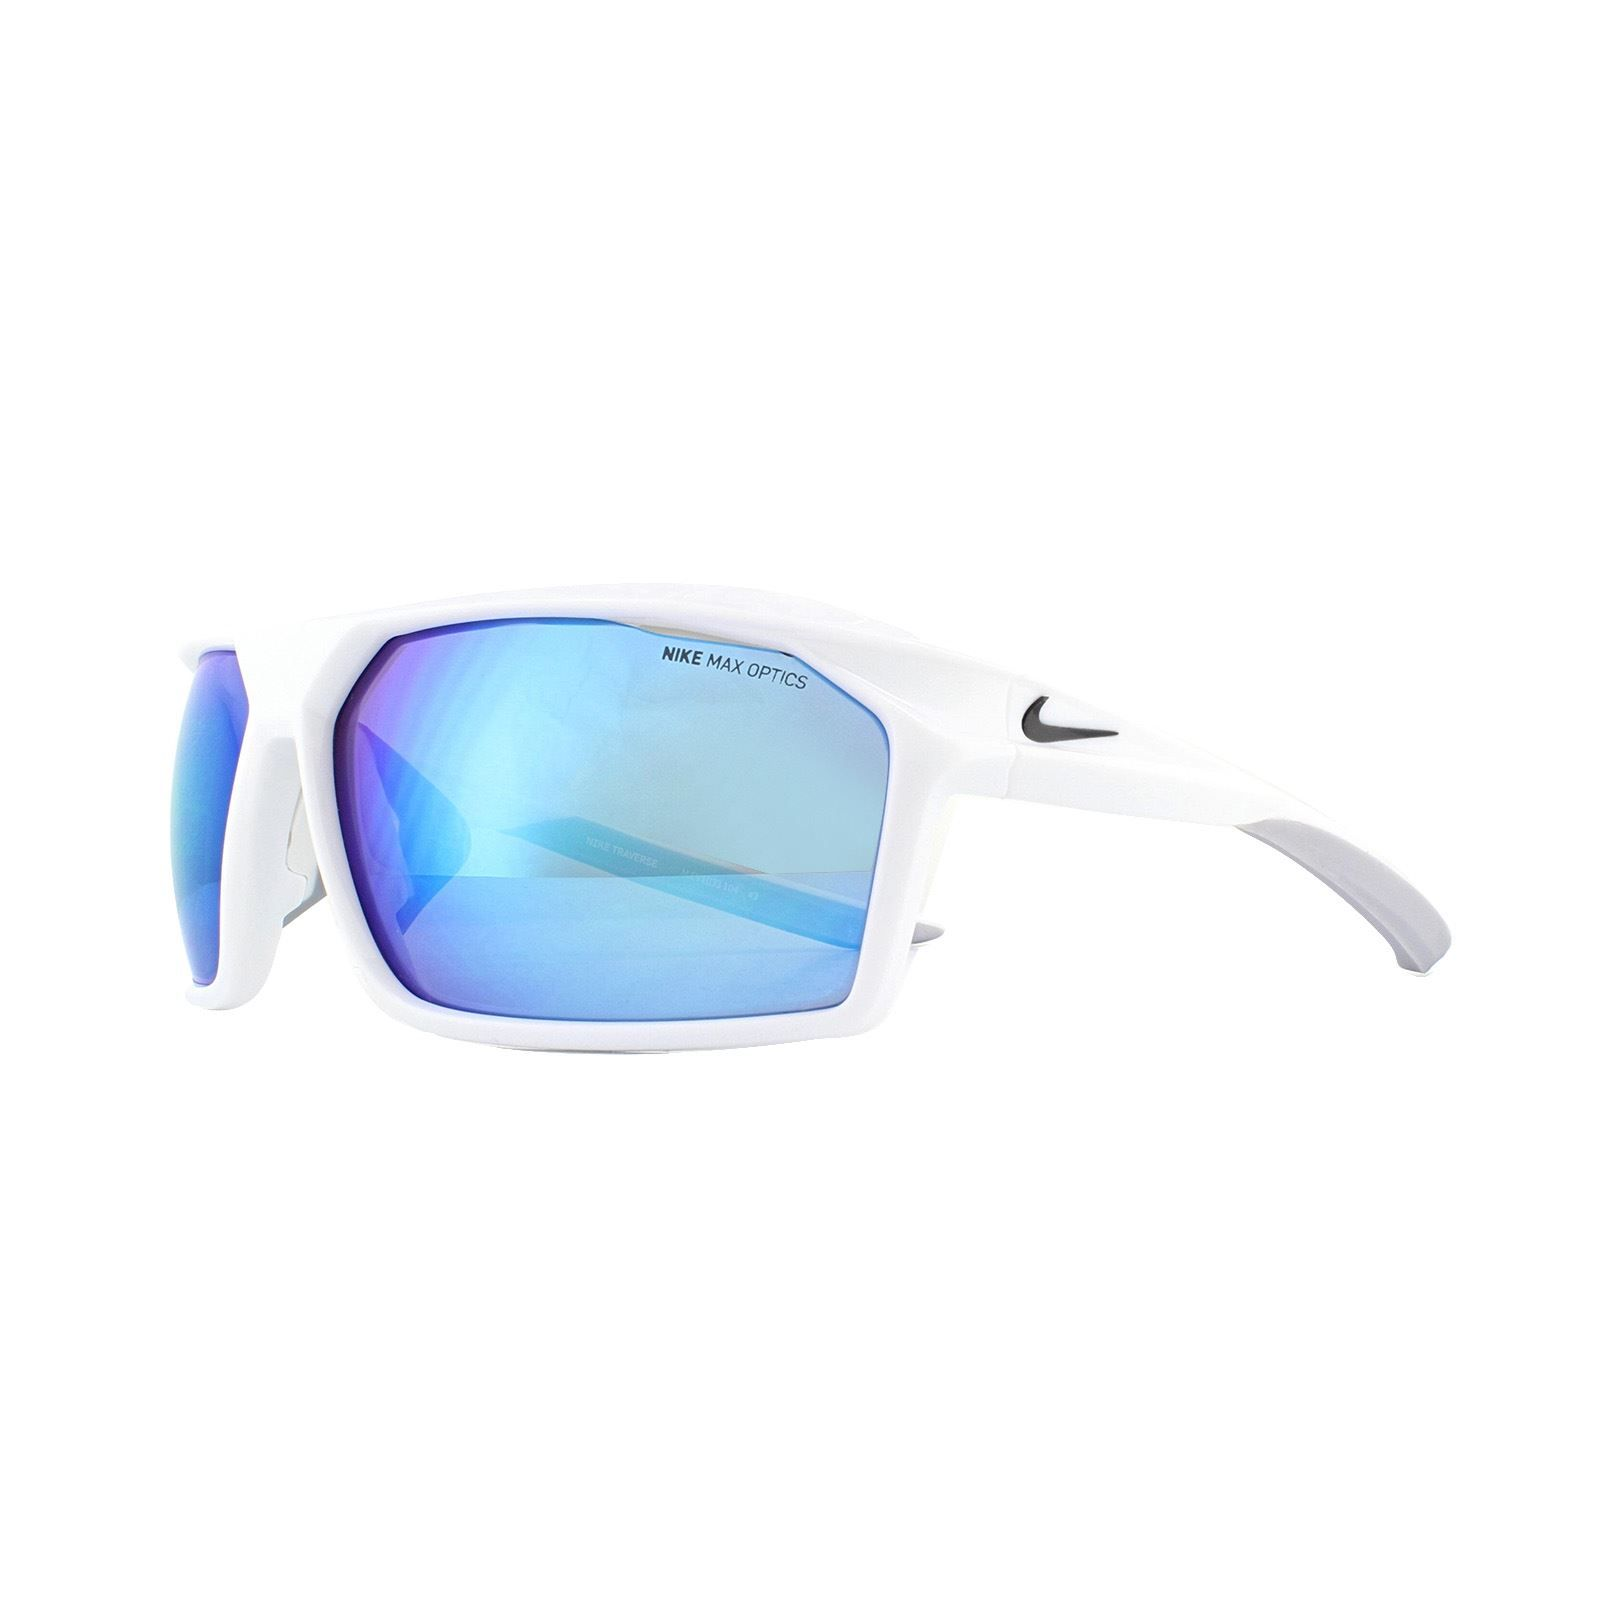 Nike Sunglasses Traverse M EV1033 104 Shiny White Grey Blue Mirror